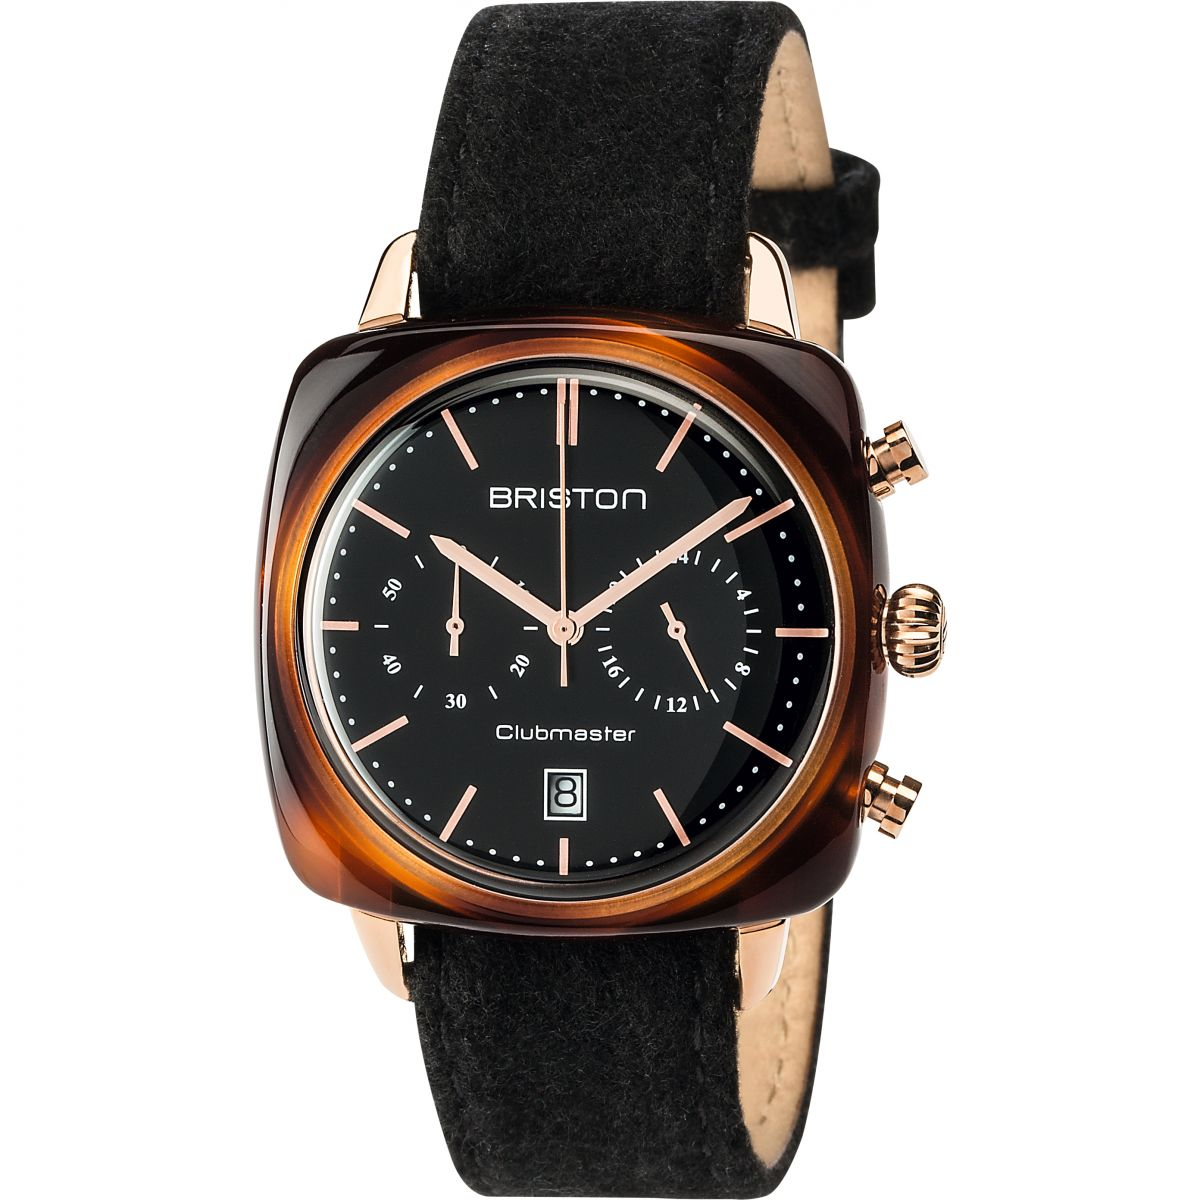 unisexe briston clubmaster vintage actate chronographe montre 17140 pra tv 1 lfb. Black Bedroom Furniture Sets. Home Design Ideas